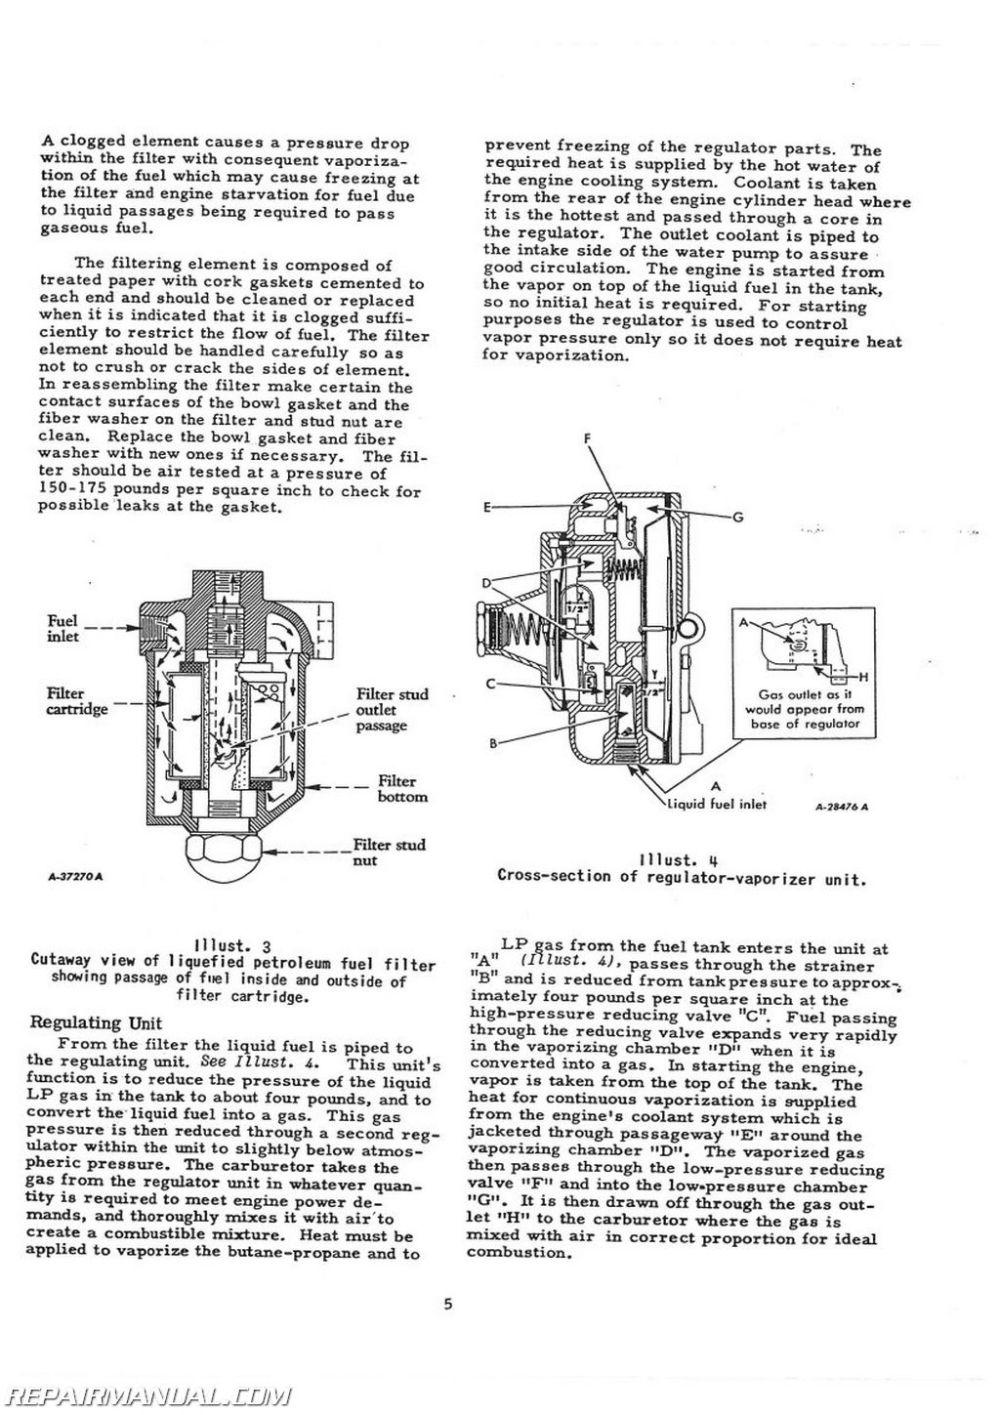 medium resolution of farmall super mta wiring diagram farmall free engine 12v conversion farmall super c farmall super c wiring schematic